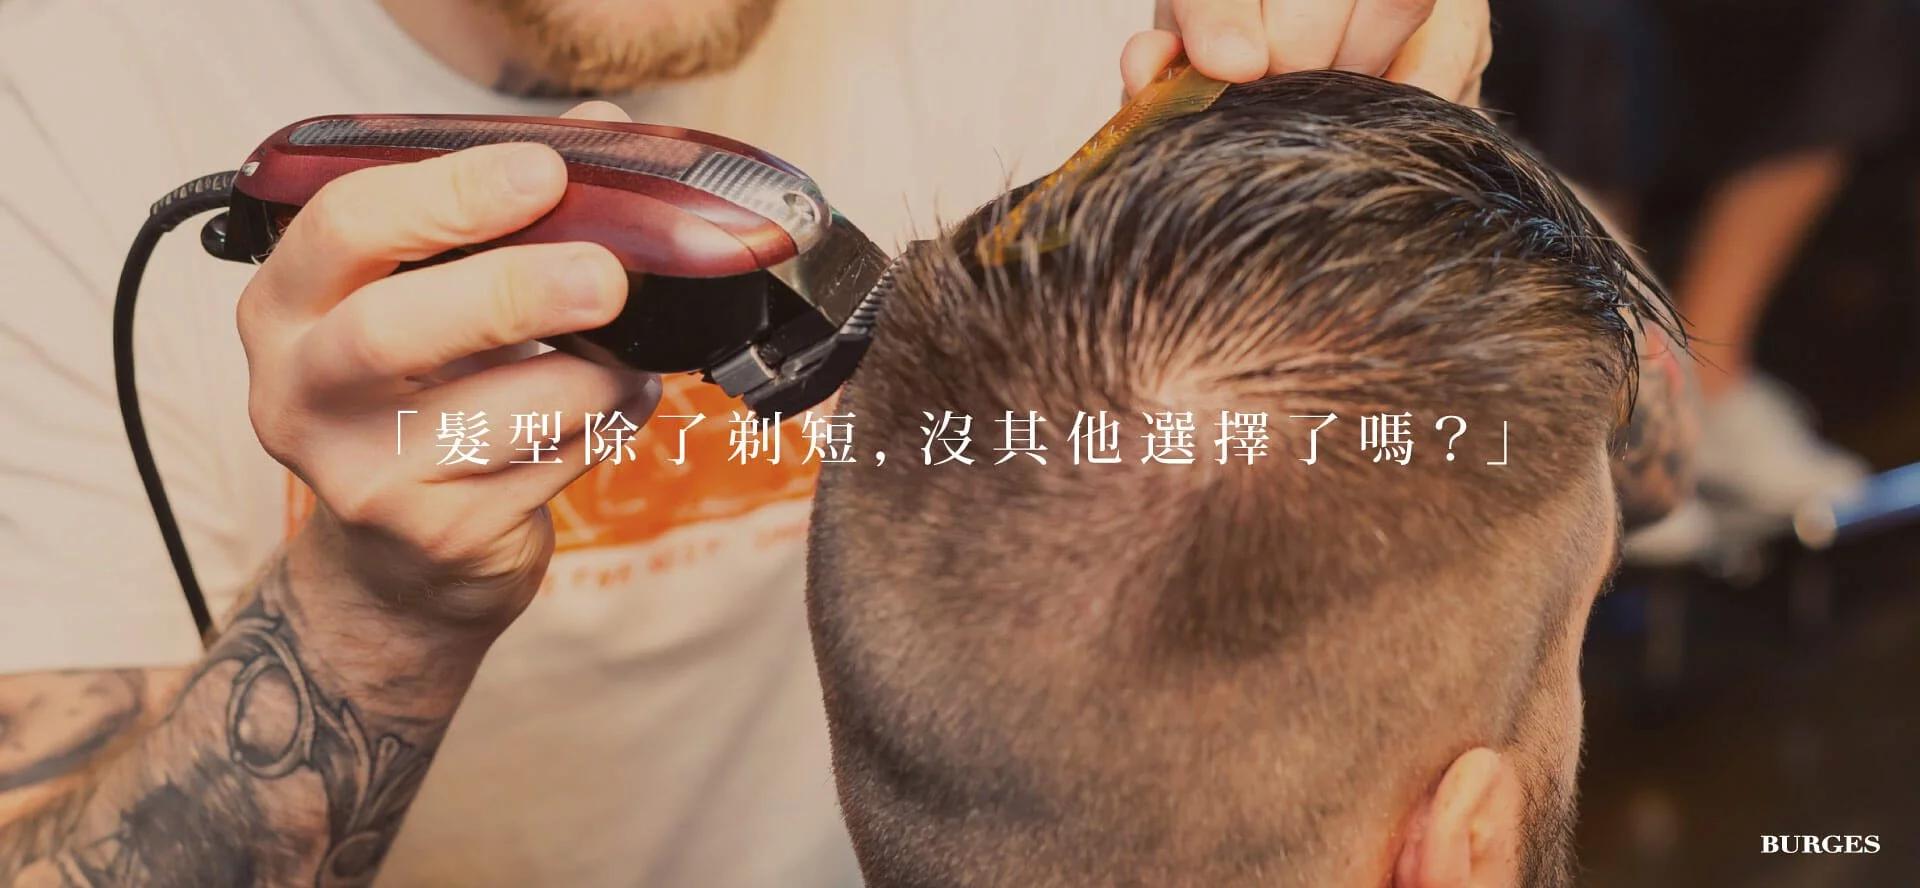 burges-blog-男士髮型指南-男士髮型除了剃短;沒其他選擇了嗎?